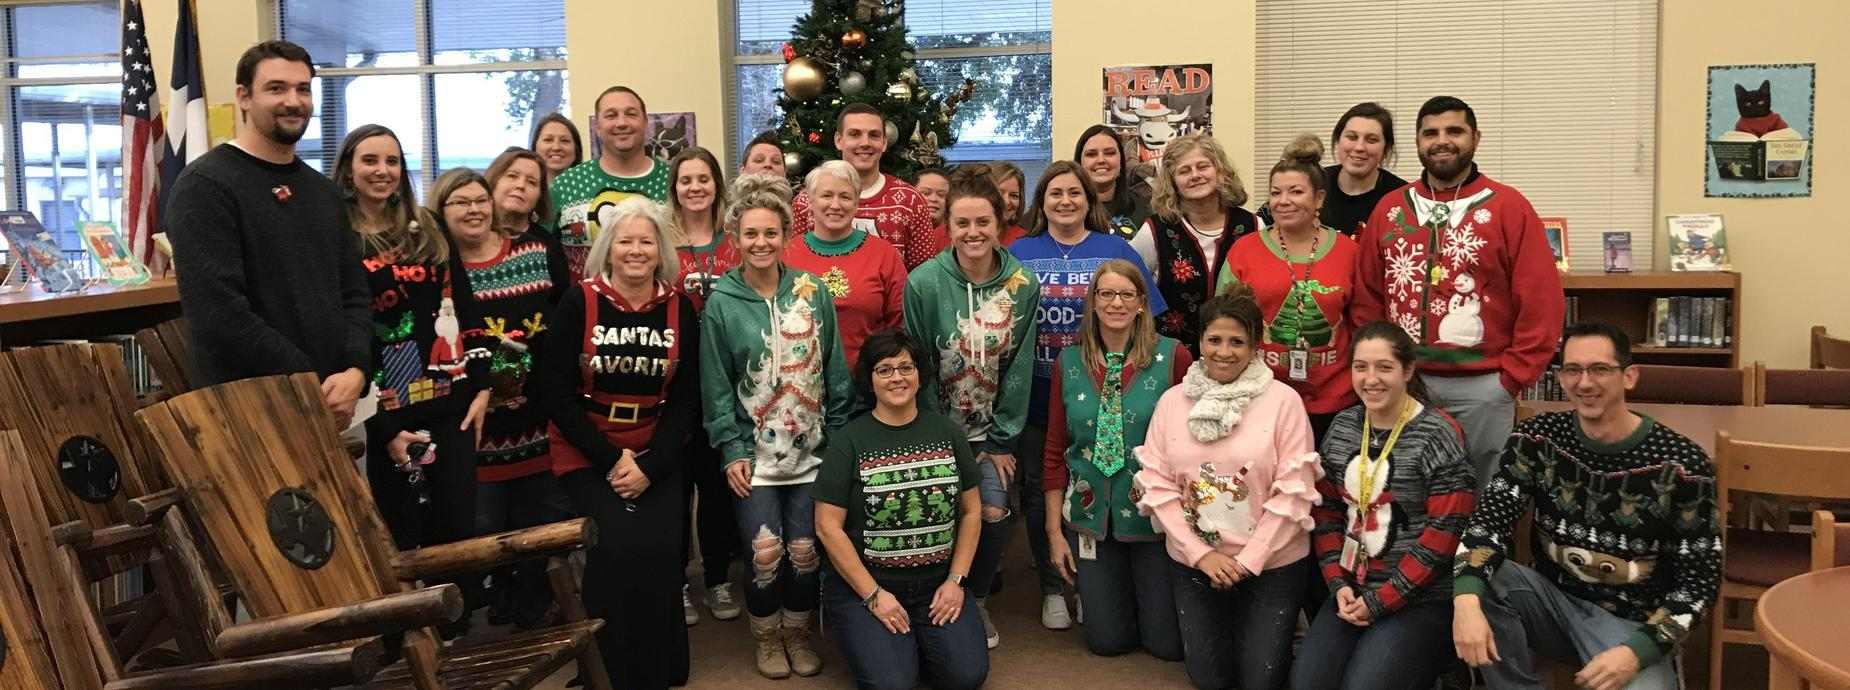 Teachers wearing Christmas sweaters